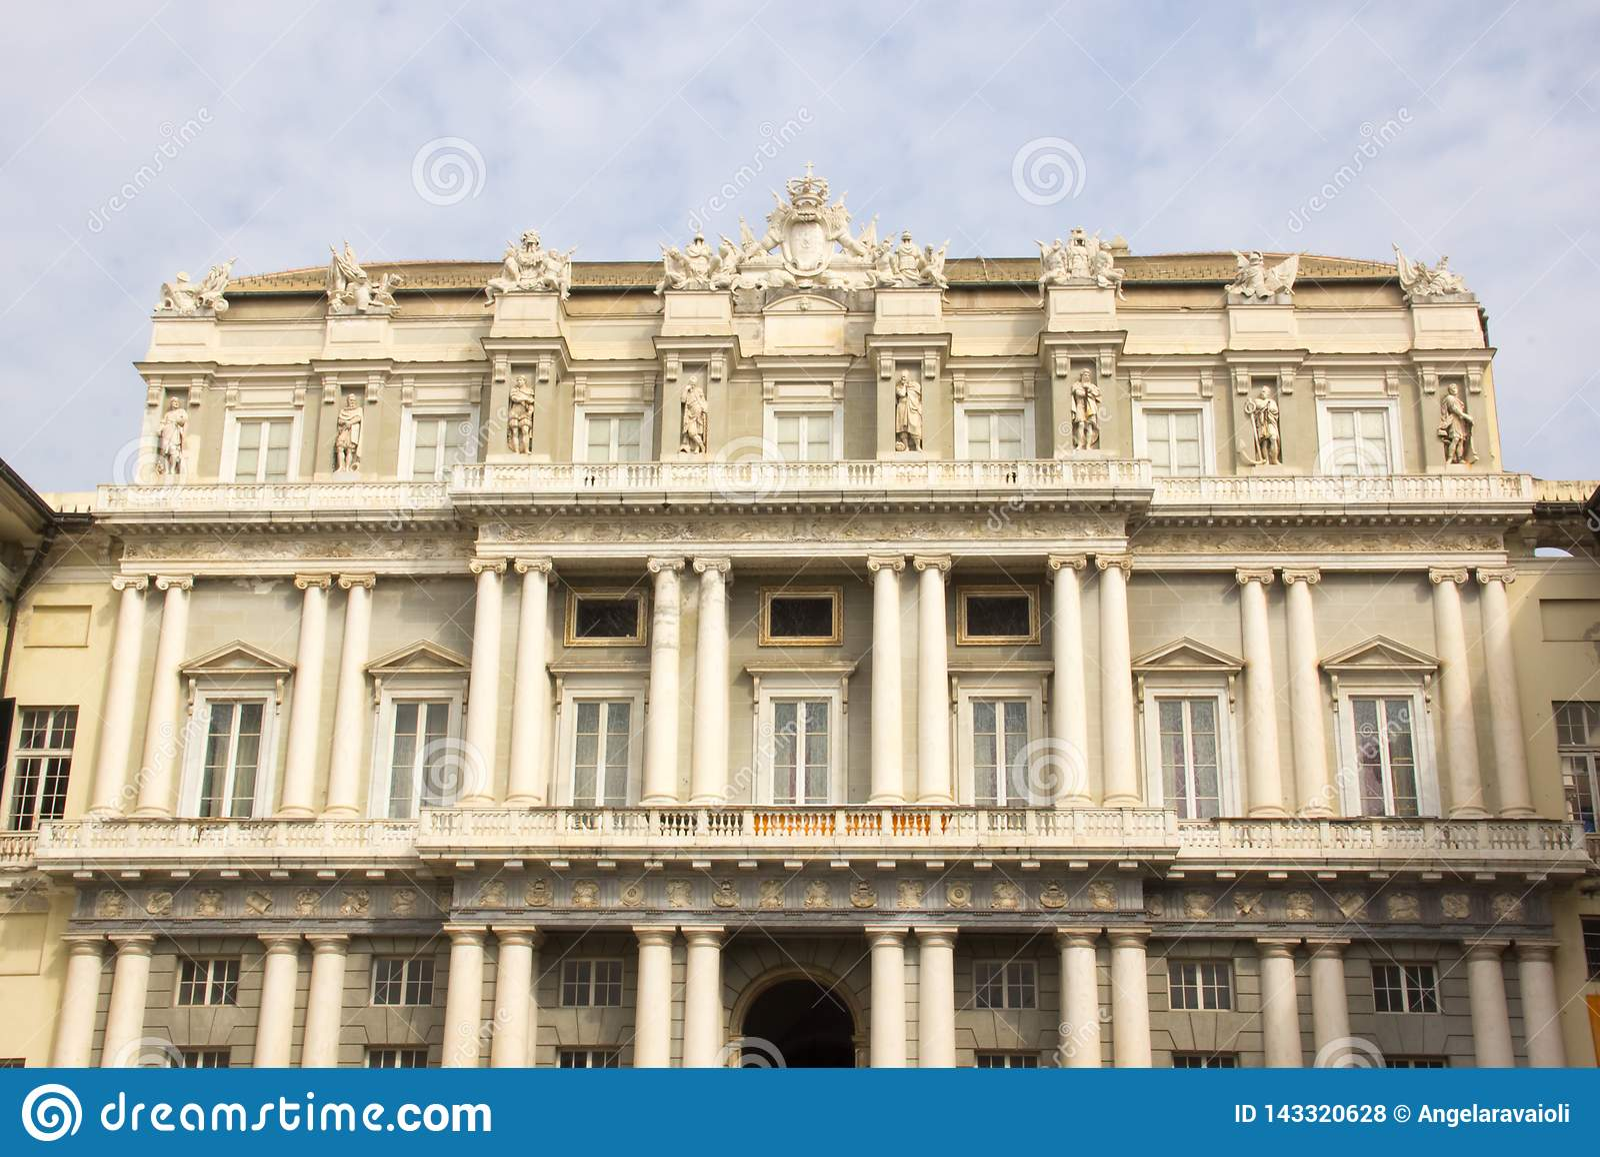 Façade del Palazzo Ducale a Genova